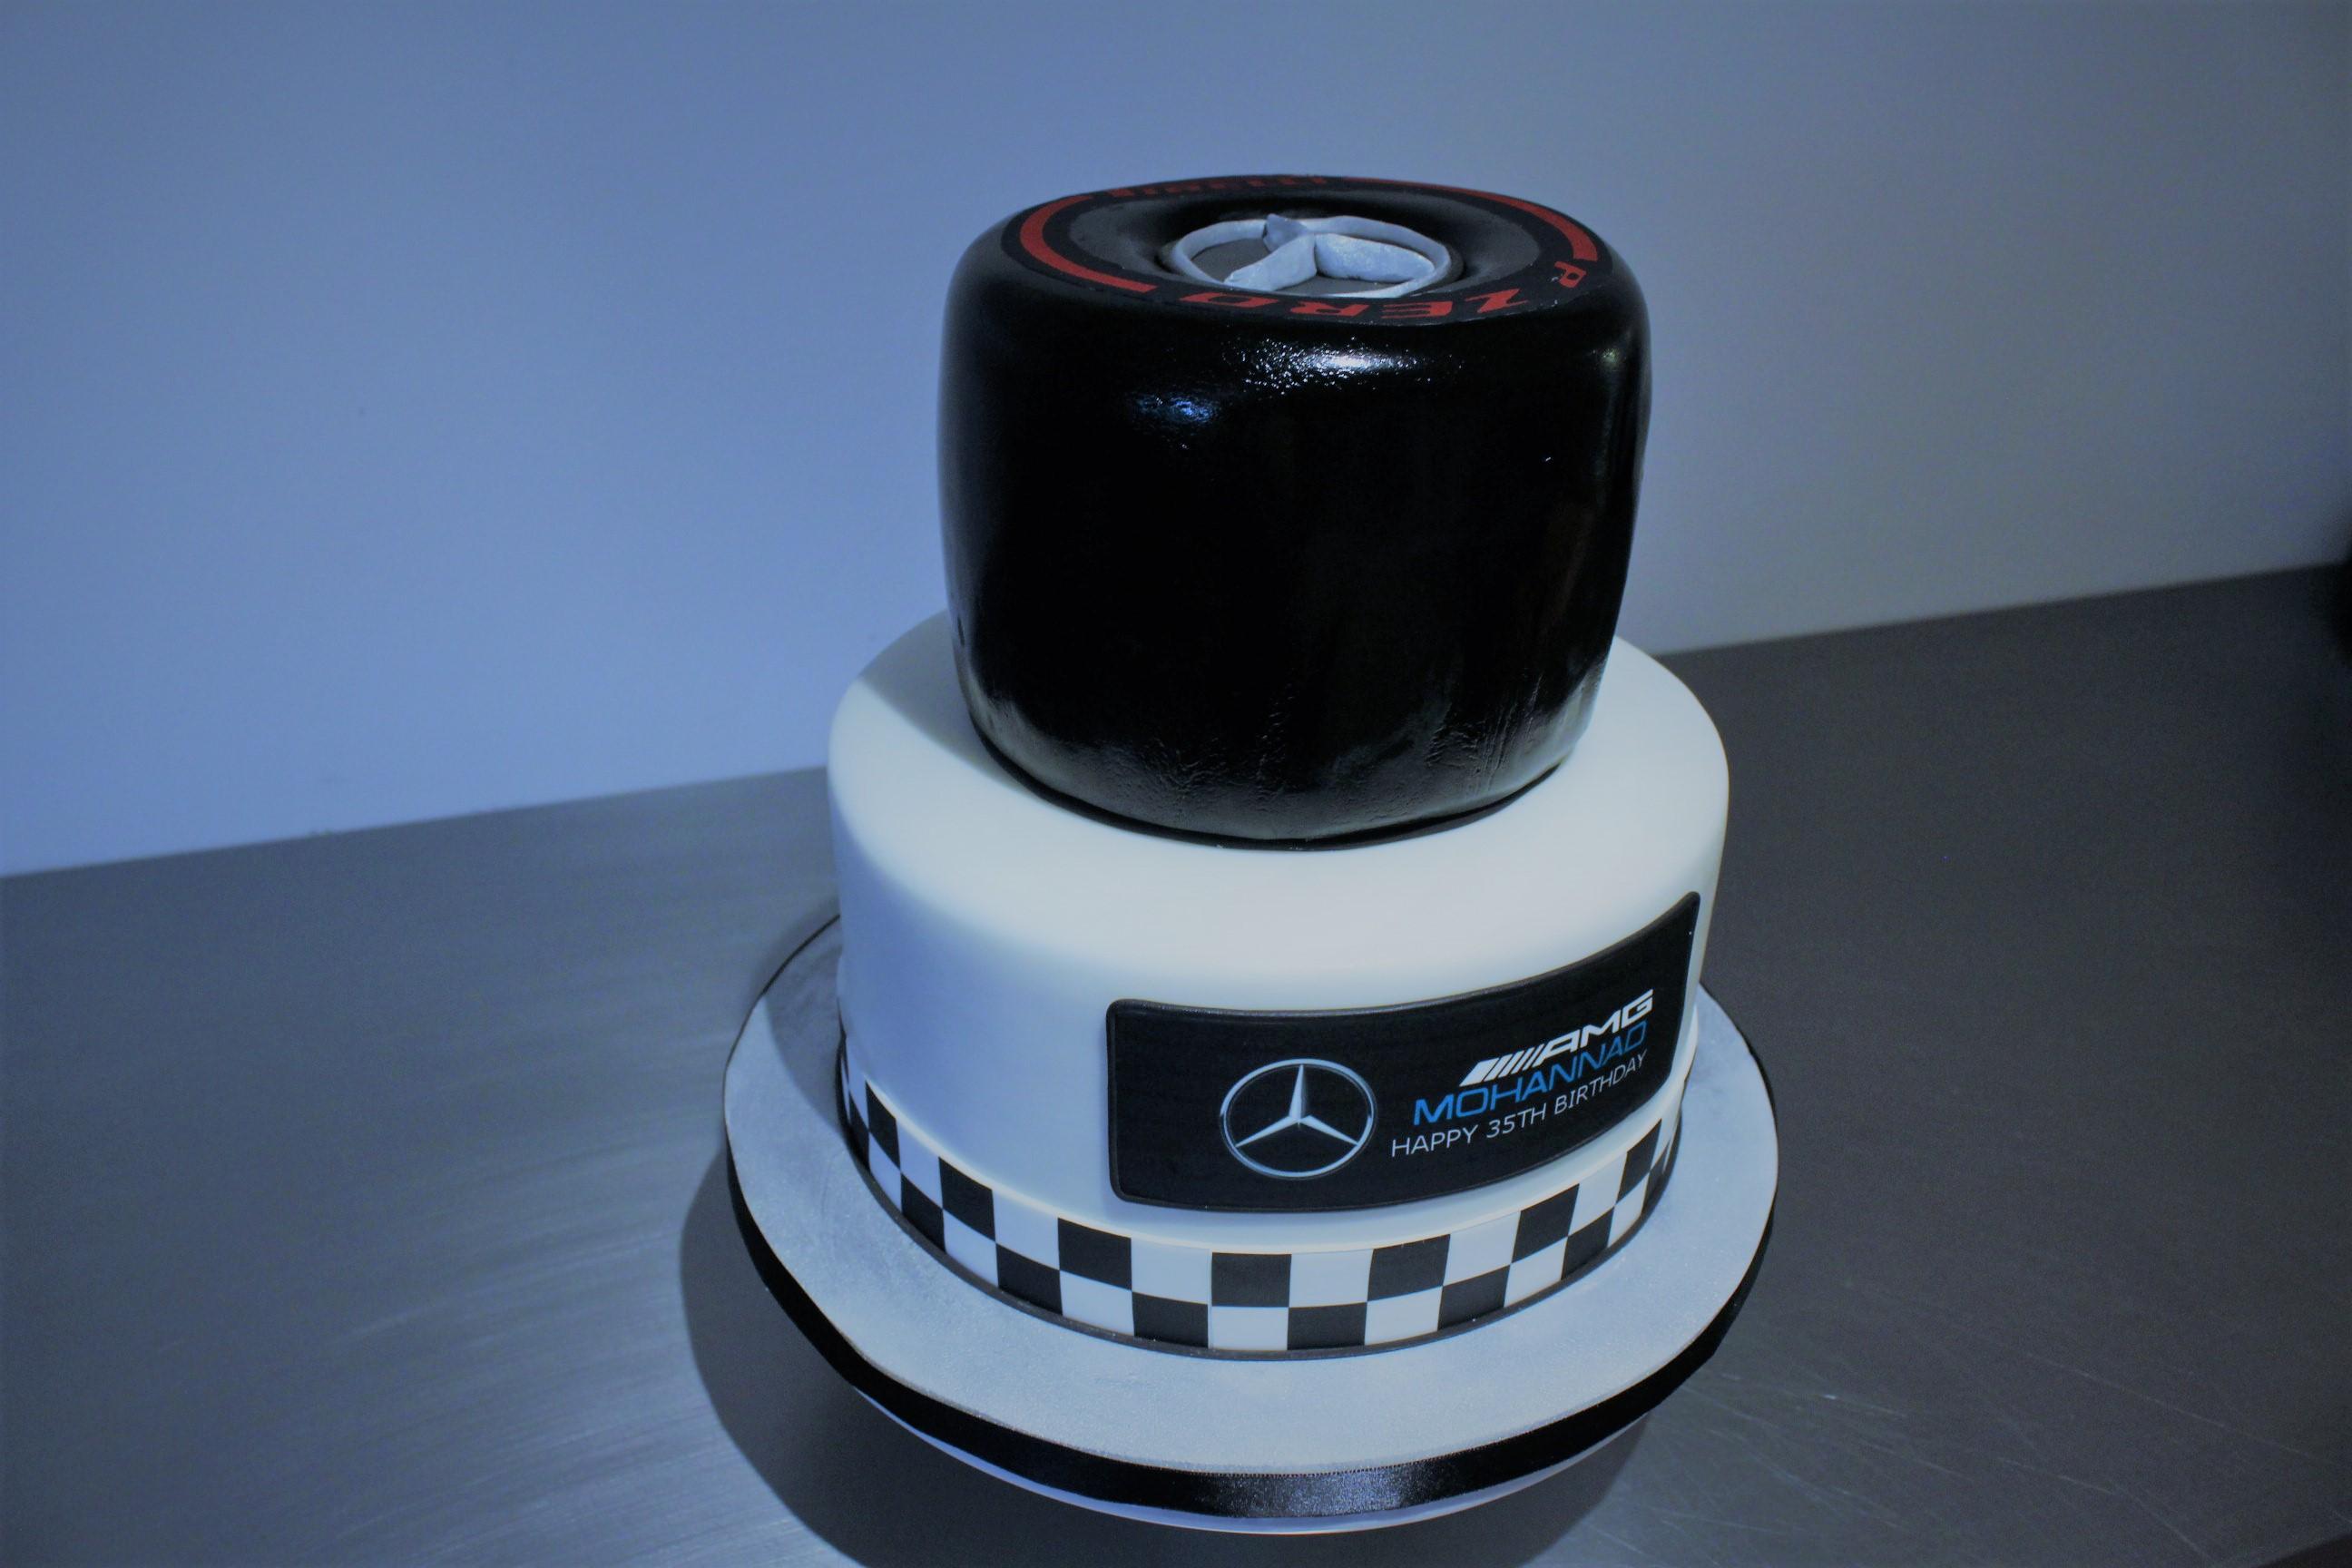 Mercedes F1 Birthday Cake Gâteau De Ville